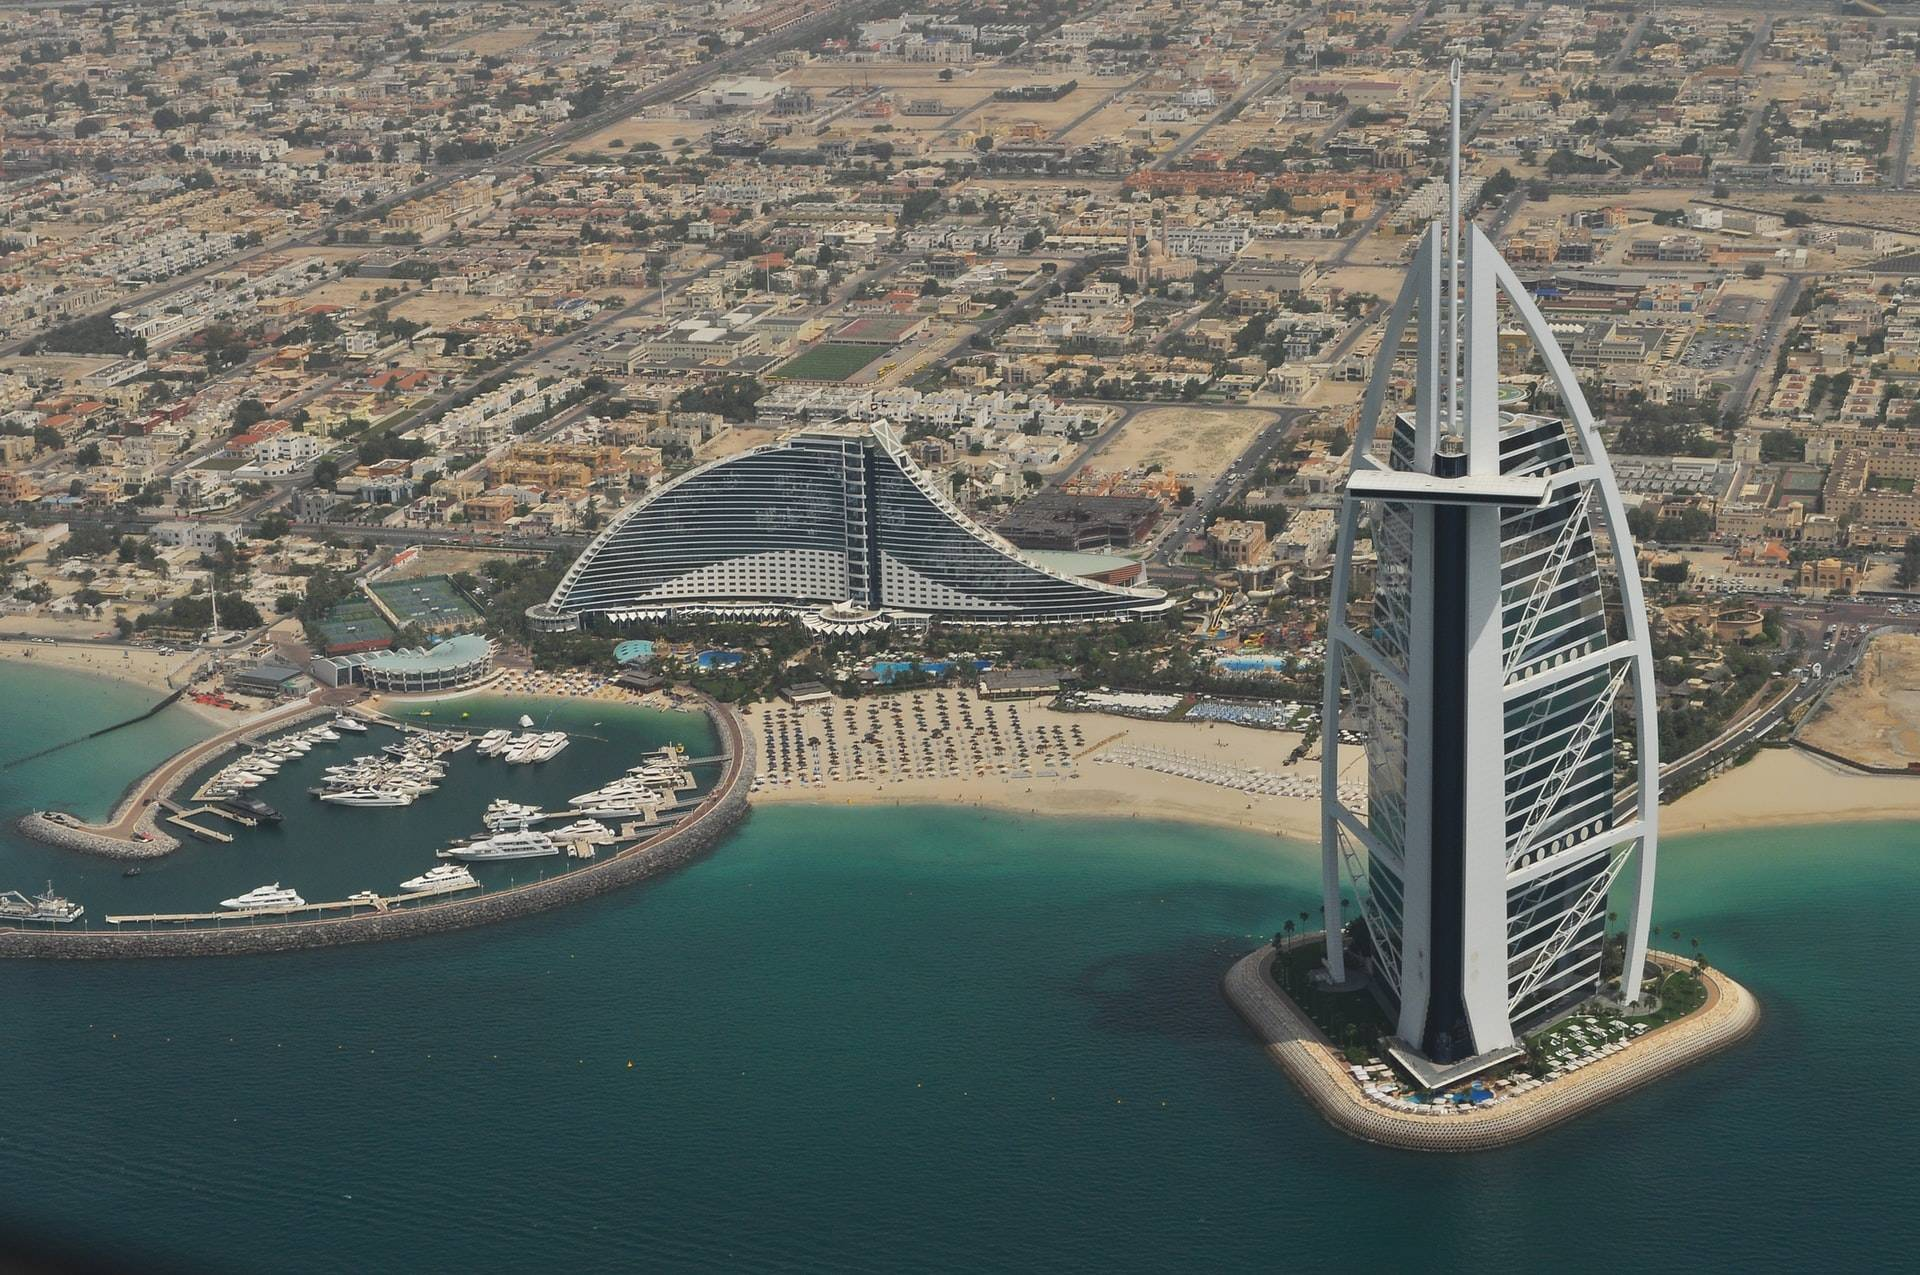 Getting Into Burj al Arab - Travel Dudes